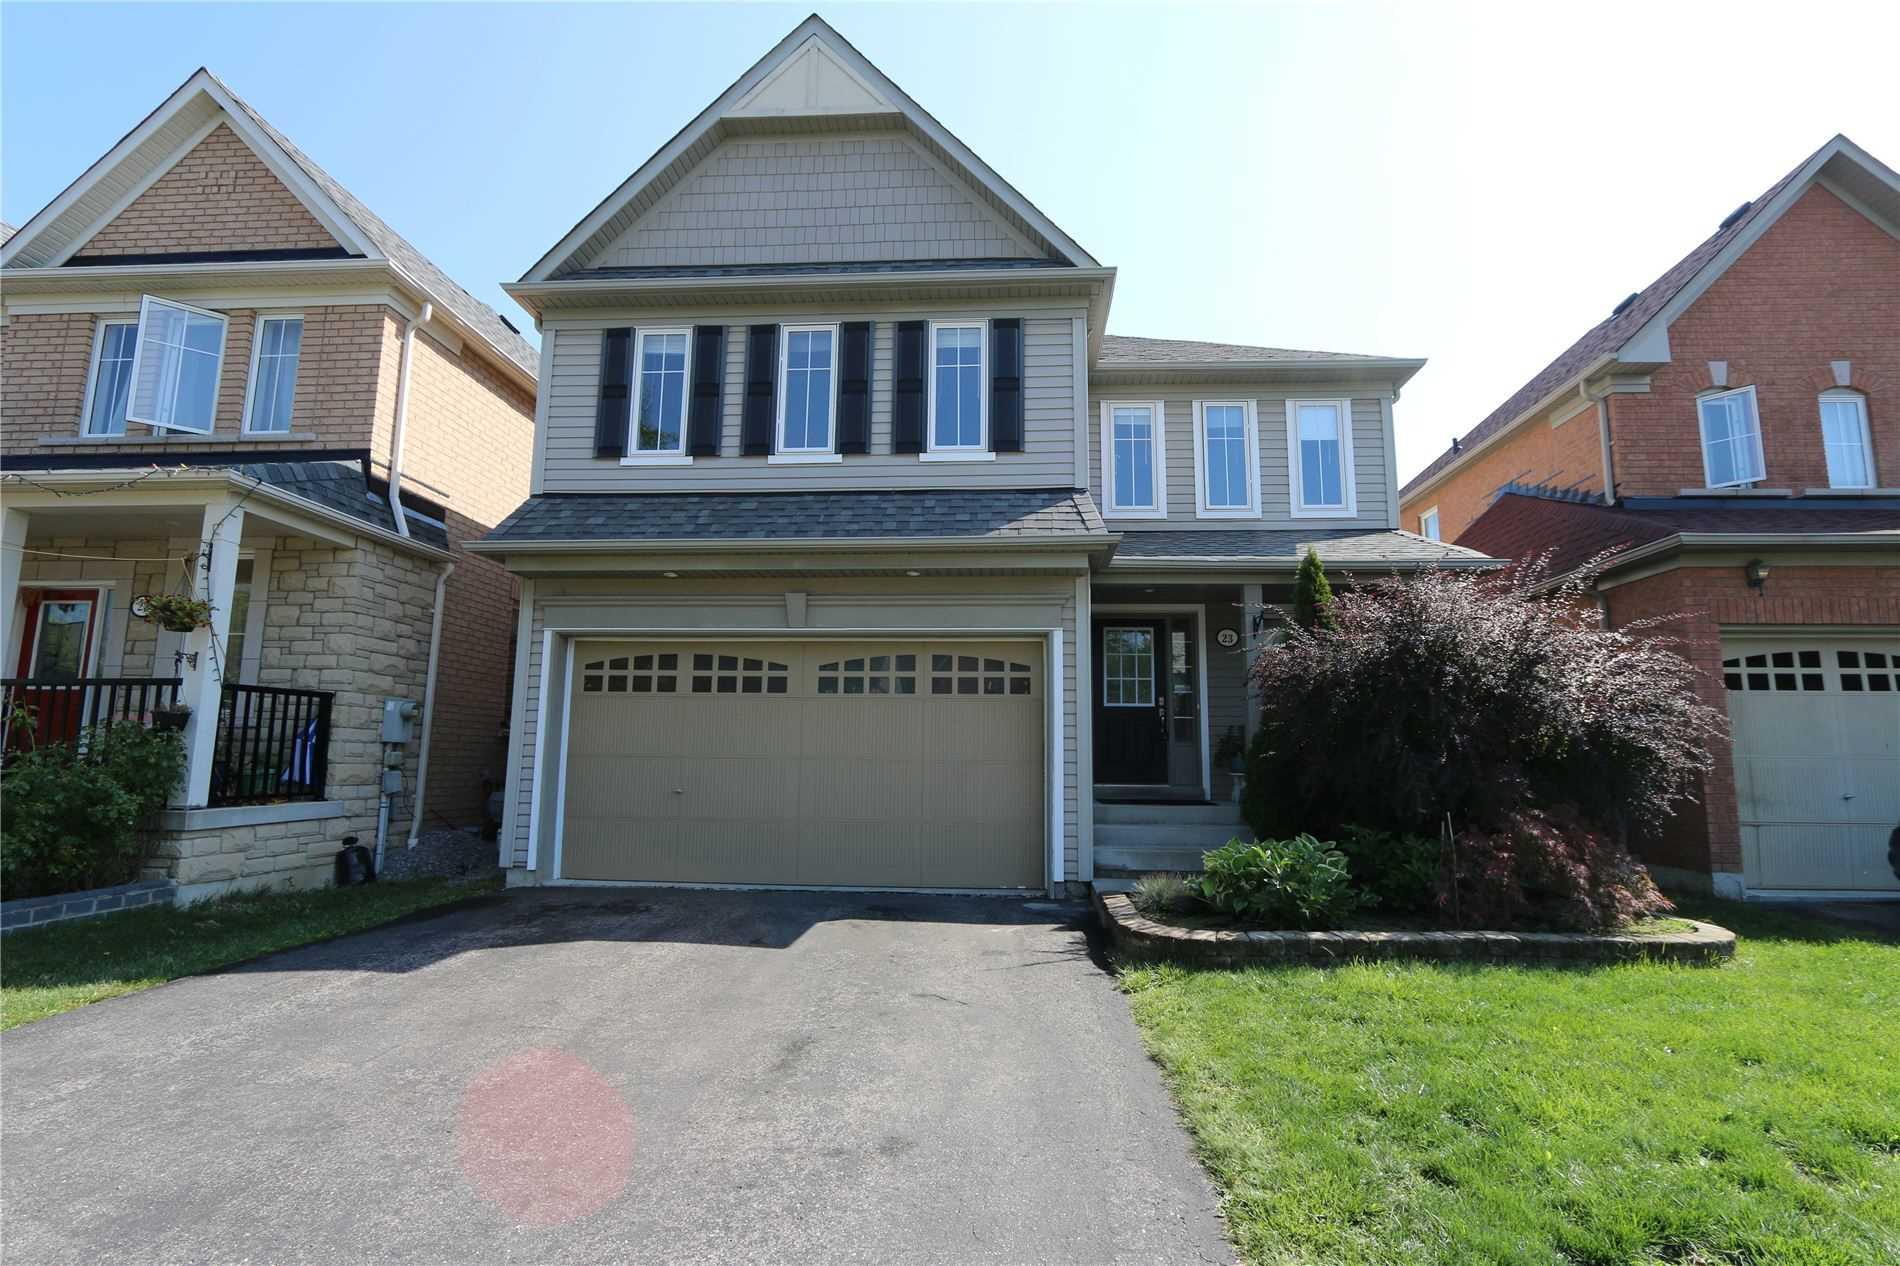 23 Tiller St, Ajax, Ontario L1Z1X9, 4 Bedrooms Bedrooms, 8 Rooms Rooms,3 BathroomsBathrooms,Detached,For Sale,Tiller,E4920689